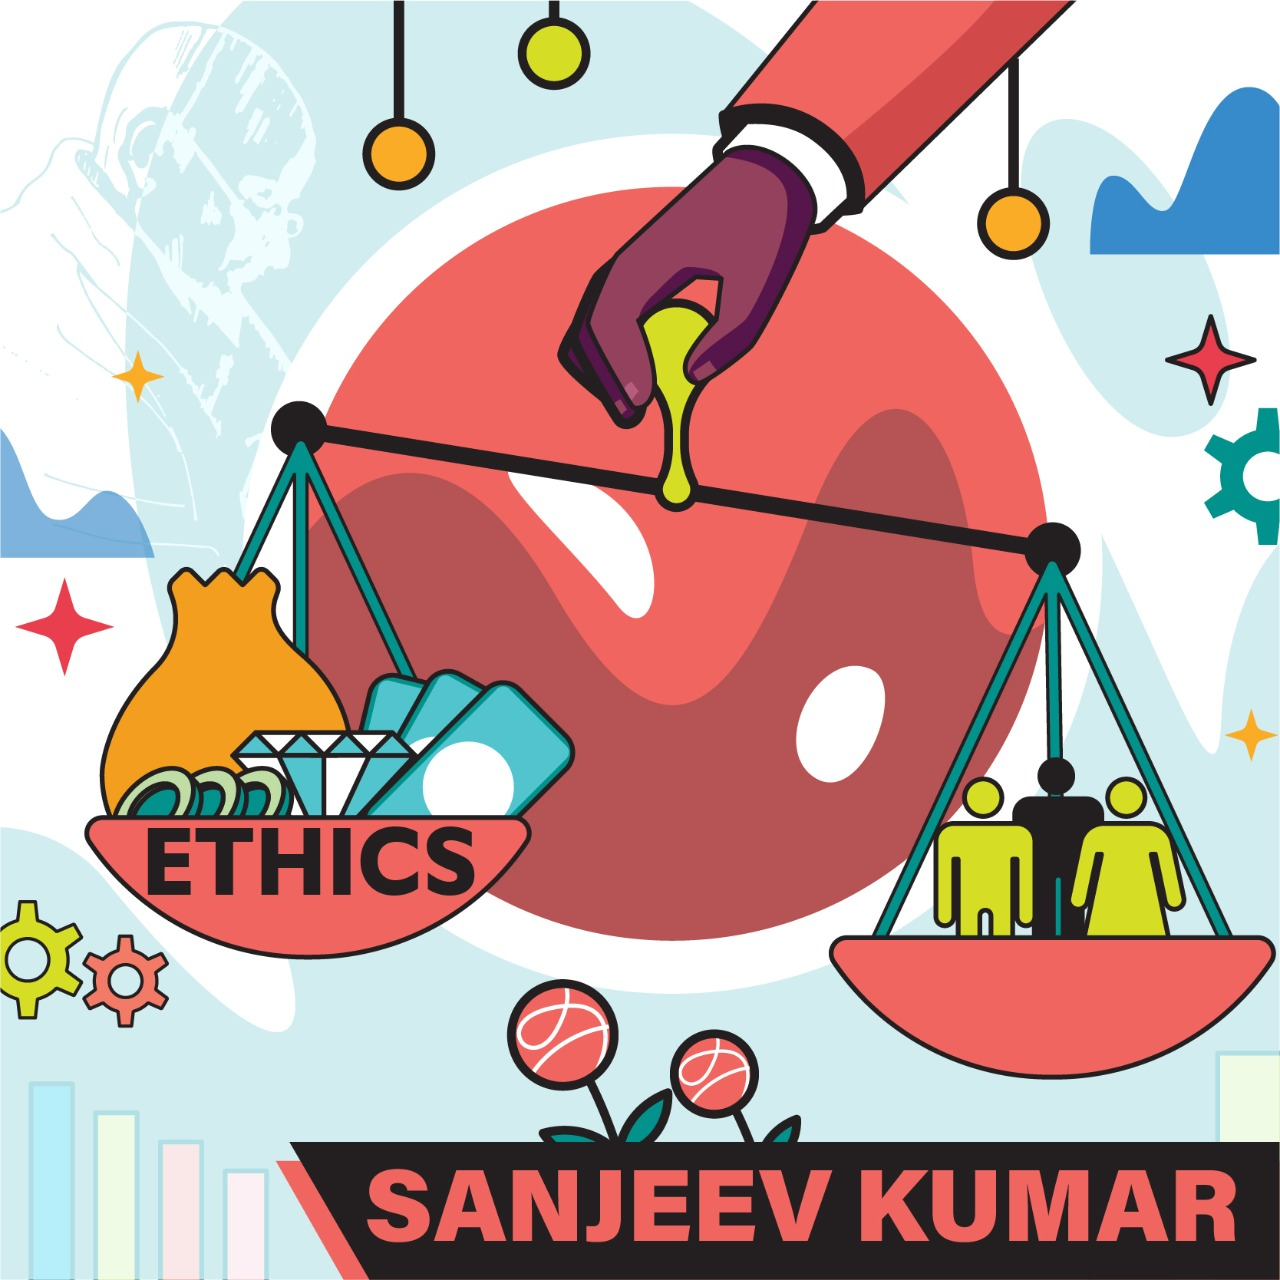 Sanjeev Kumar - ETHICS, INTEGRITY & APTITUDE